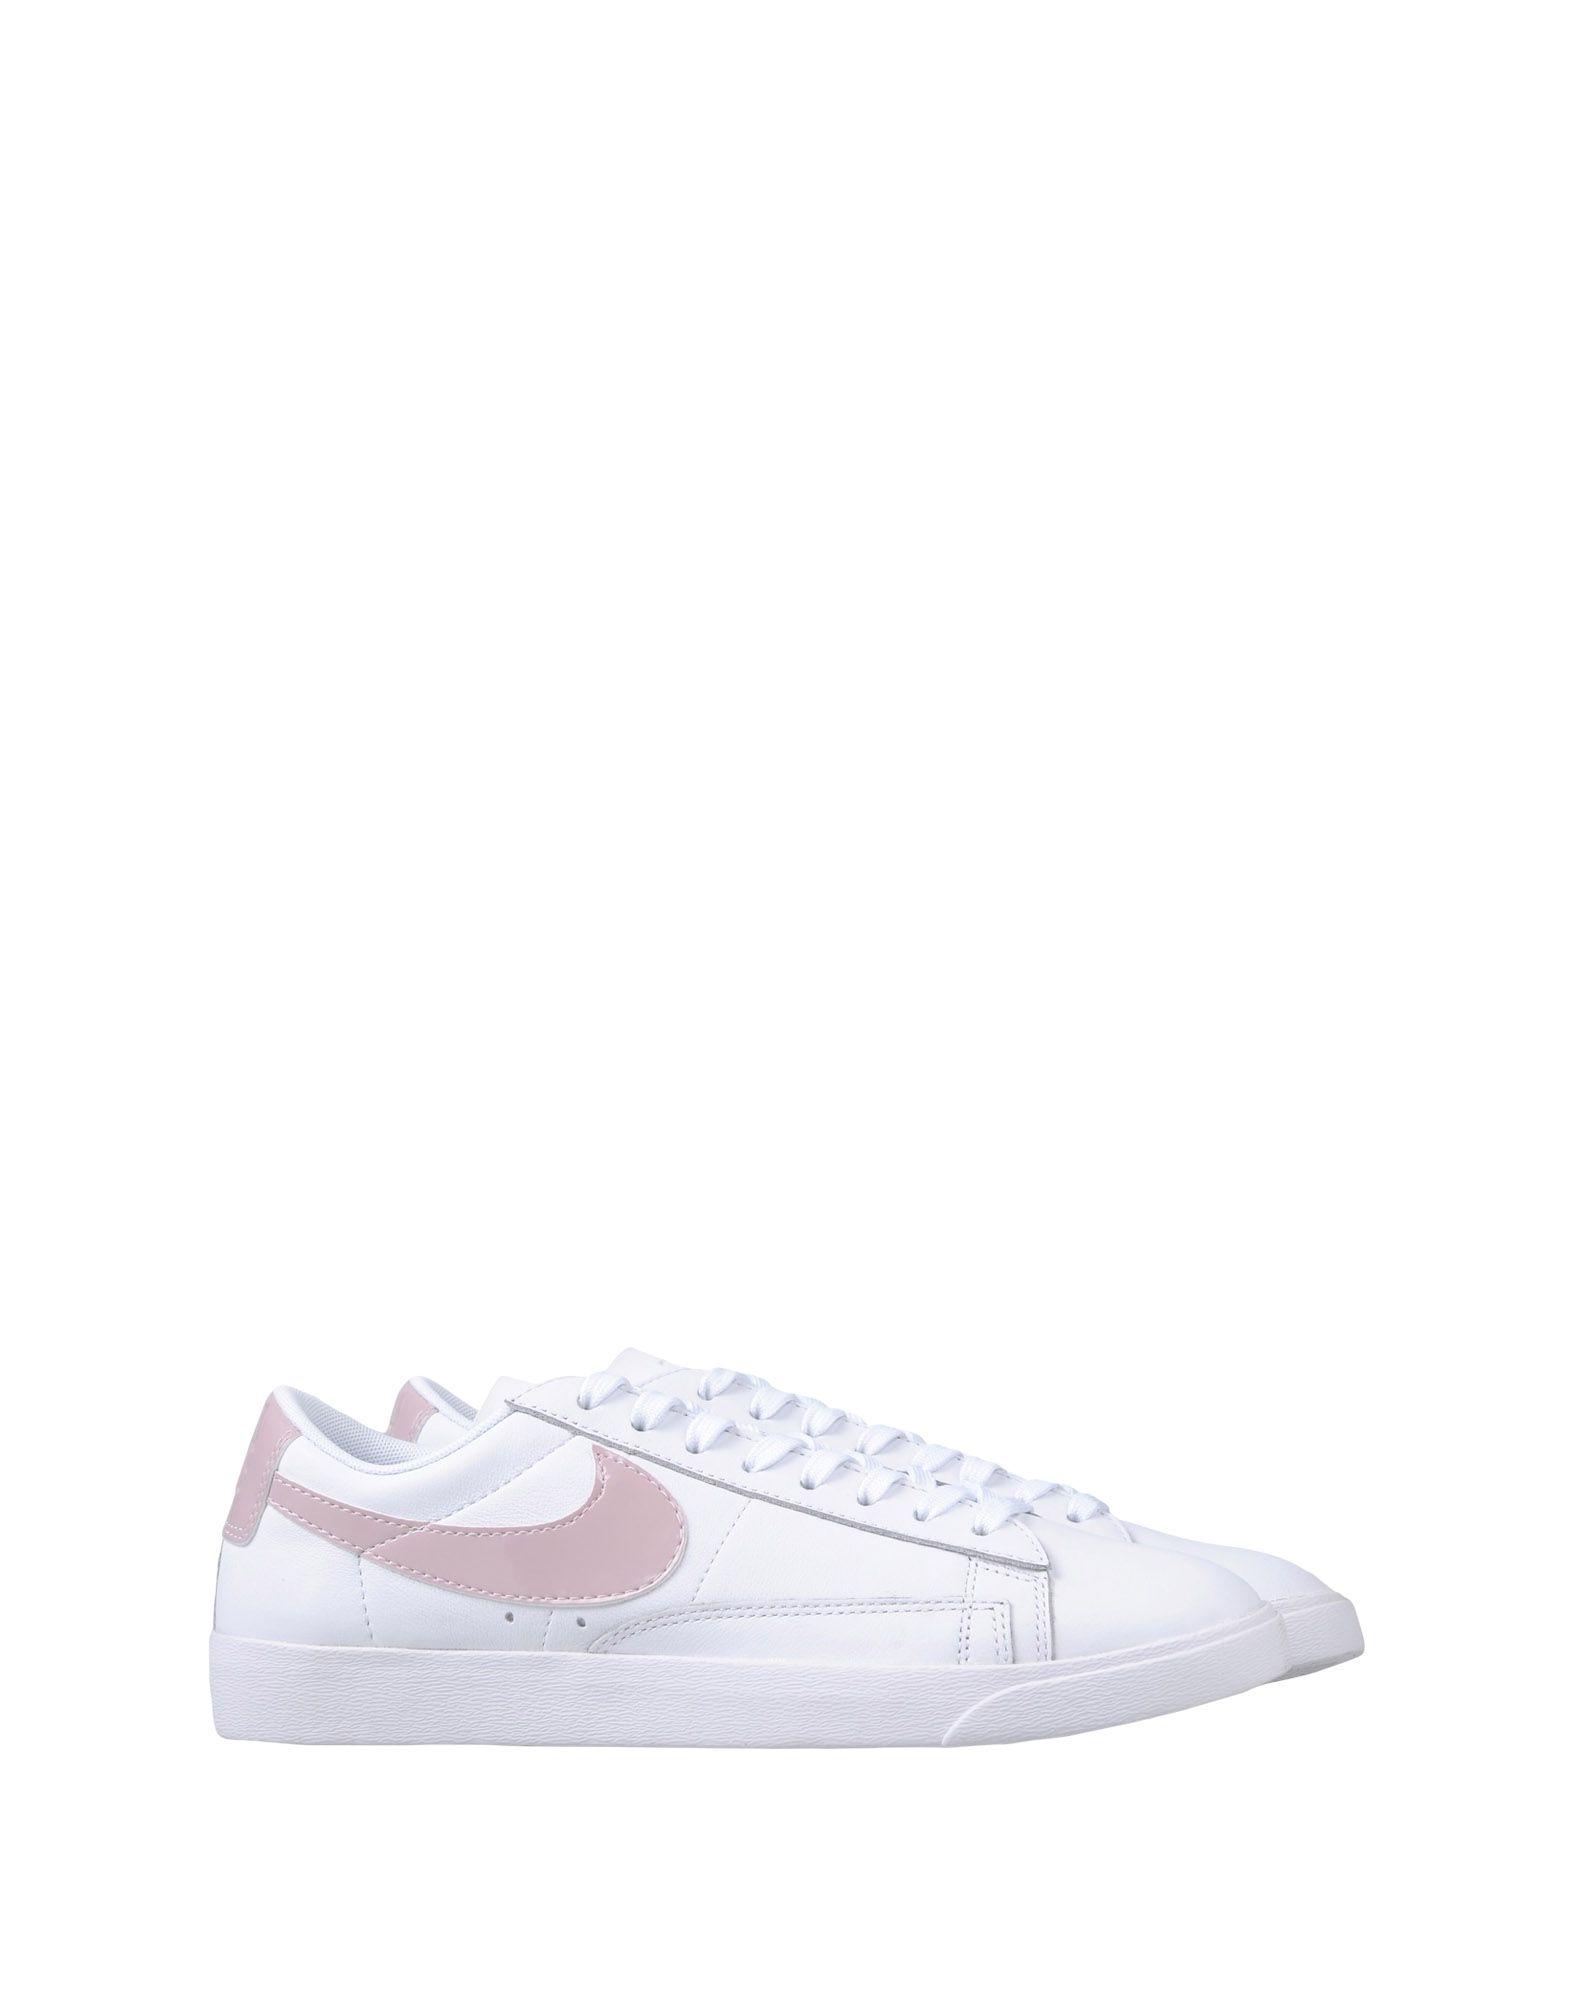 Sneakers Nike  Blazer Low - Femme - Sneakers Nike sur